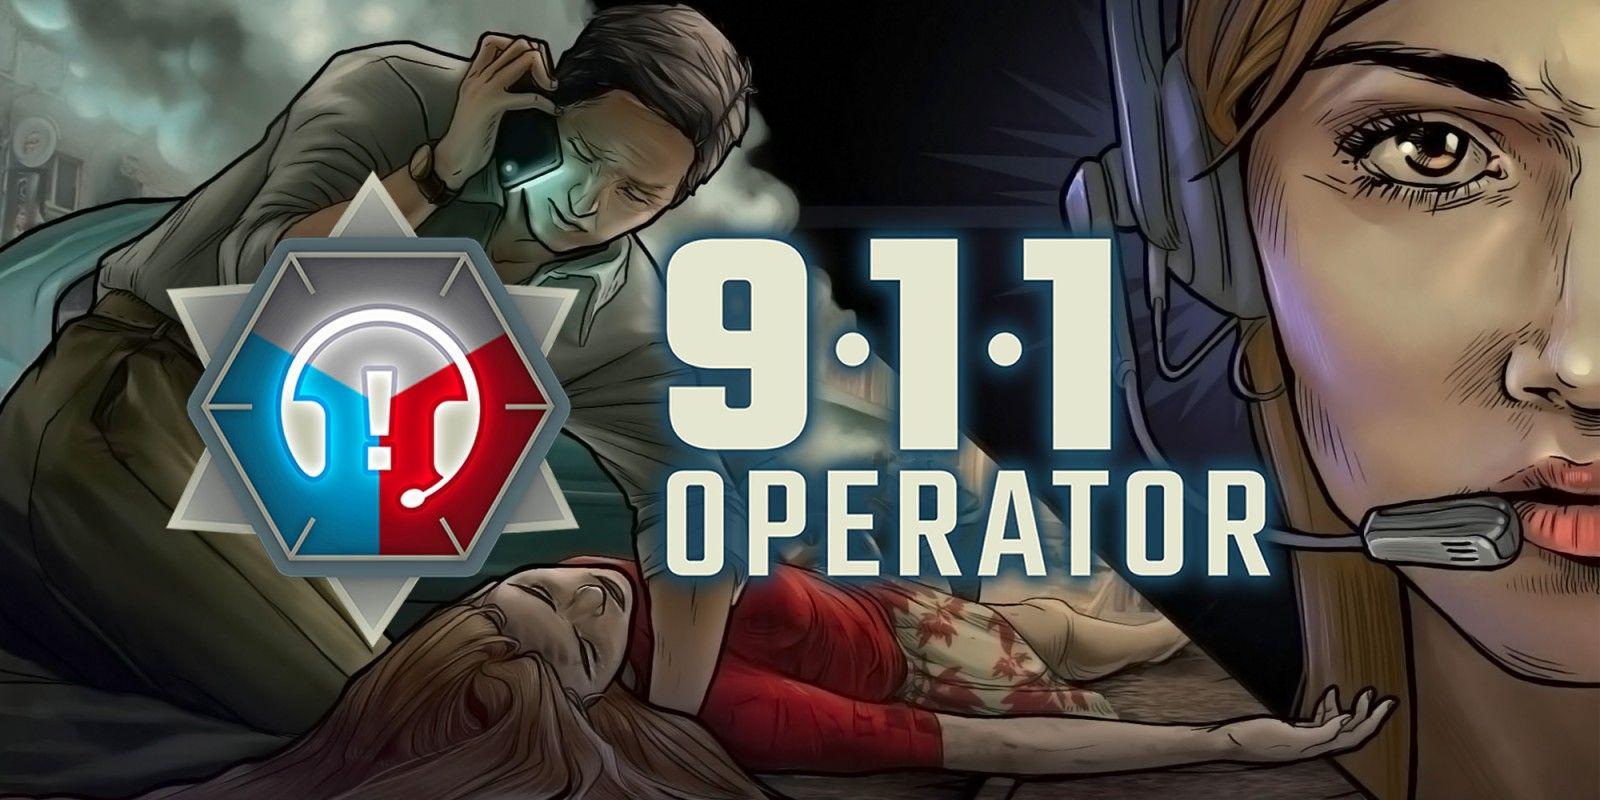 911 Operator (Nintendo Switch digital copy) - 89p @ Nintendo eShop